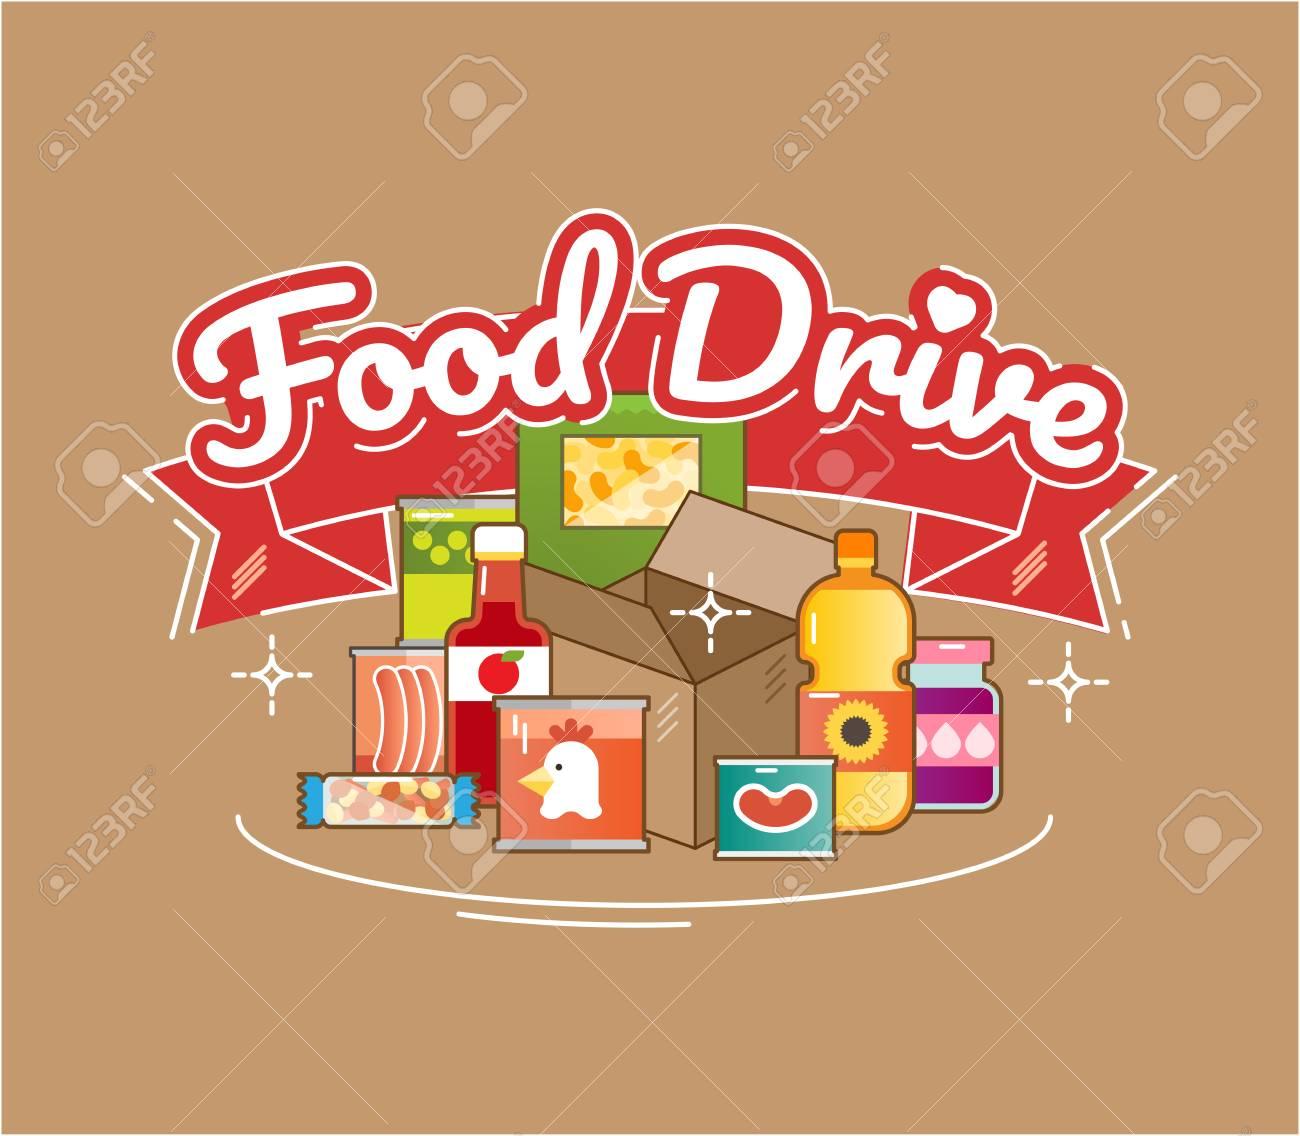 Food Drive non perishable food charity movement, vector badge logo illustration - 93650262